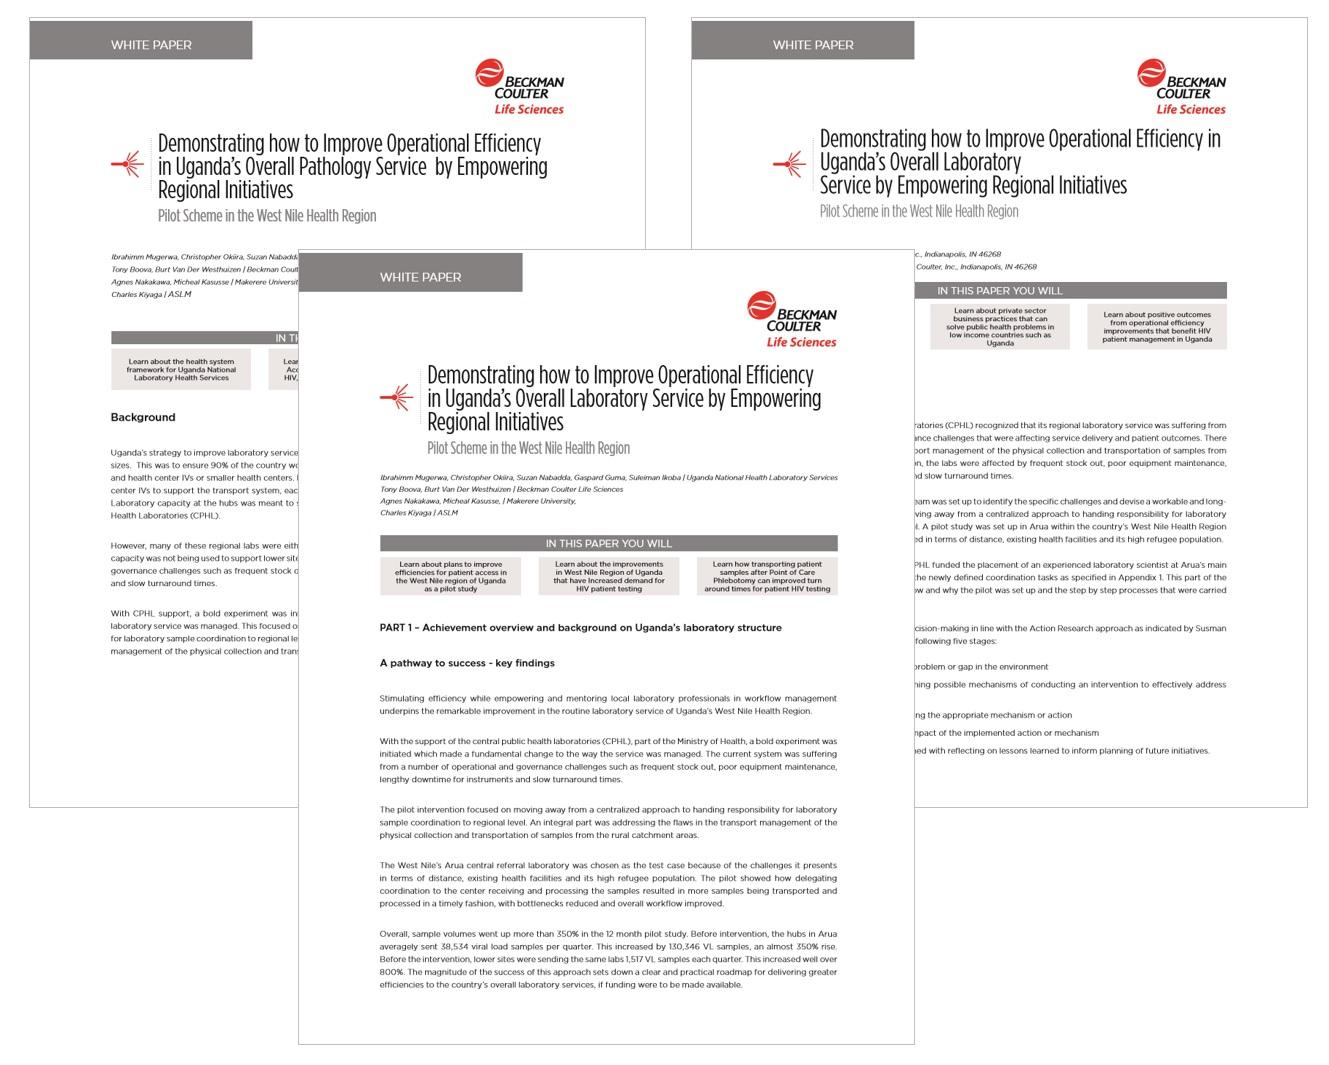 FLOWC-HIV White paper trio V2 - Section 3